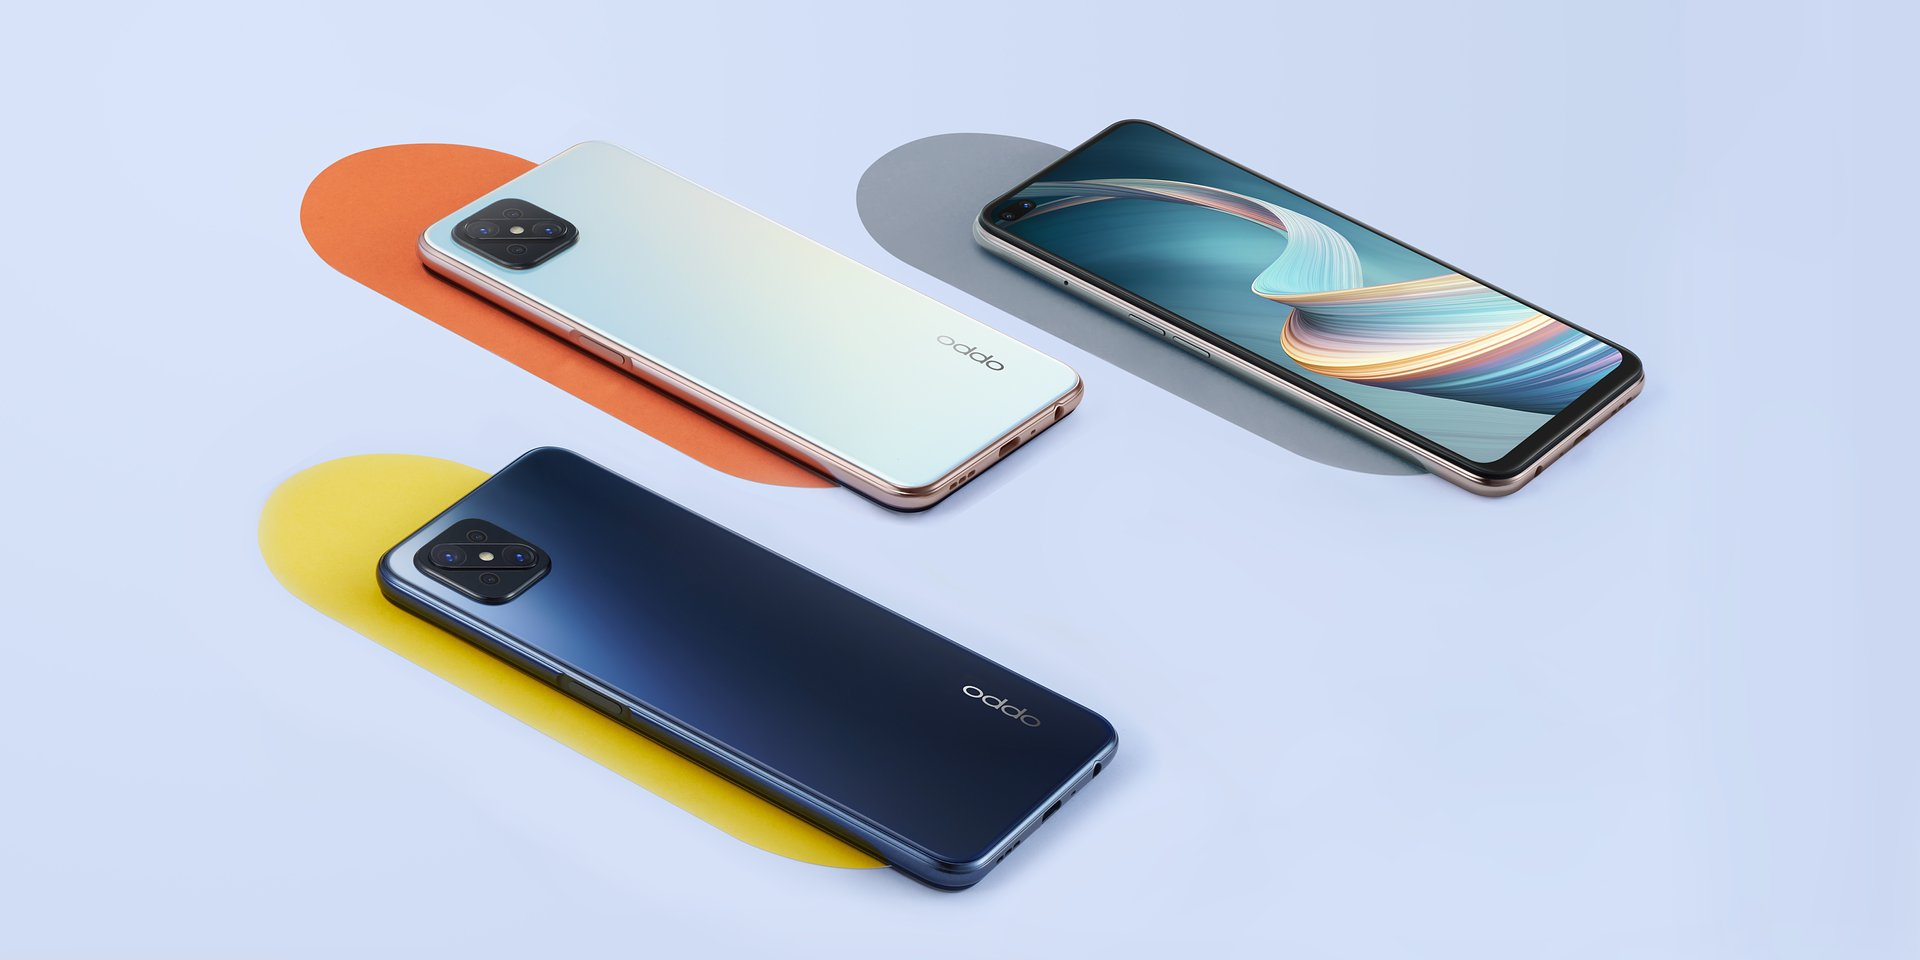 smartfon Oppo Reno 4 Z 5G smartphone